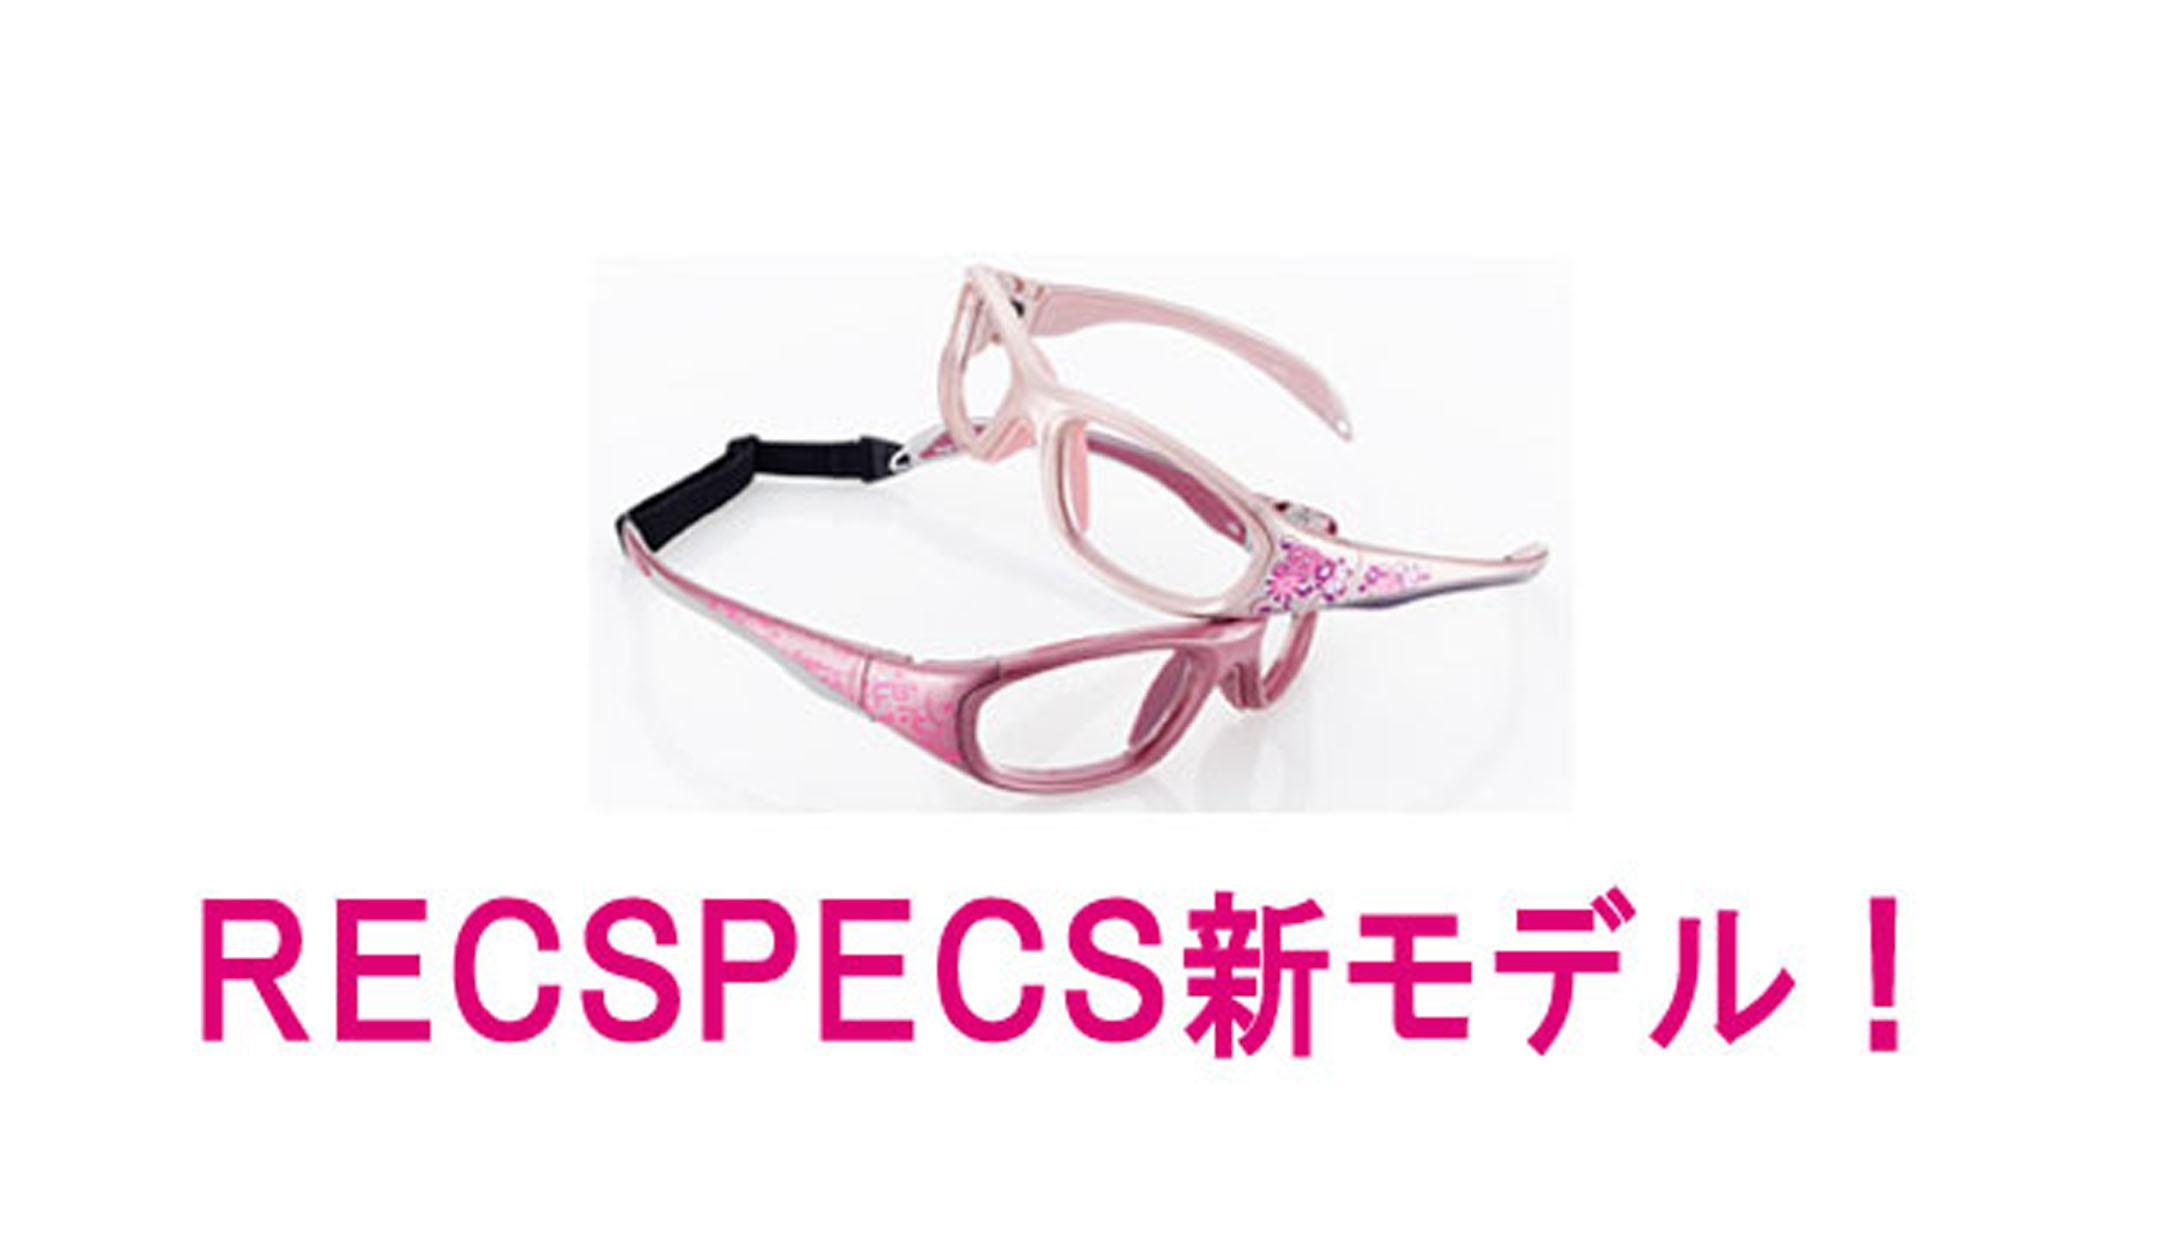 RECSPECSに新モデルが登場!!